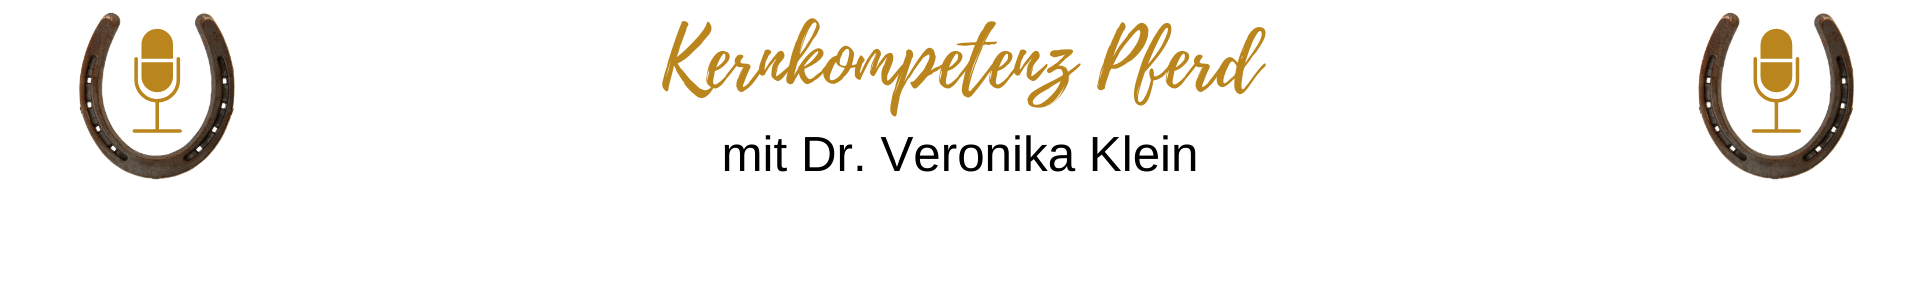 kernkompetenz-pferd-logo-rechts-links